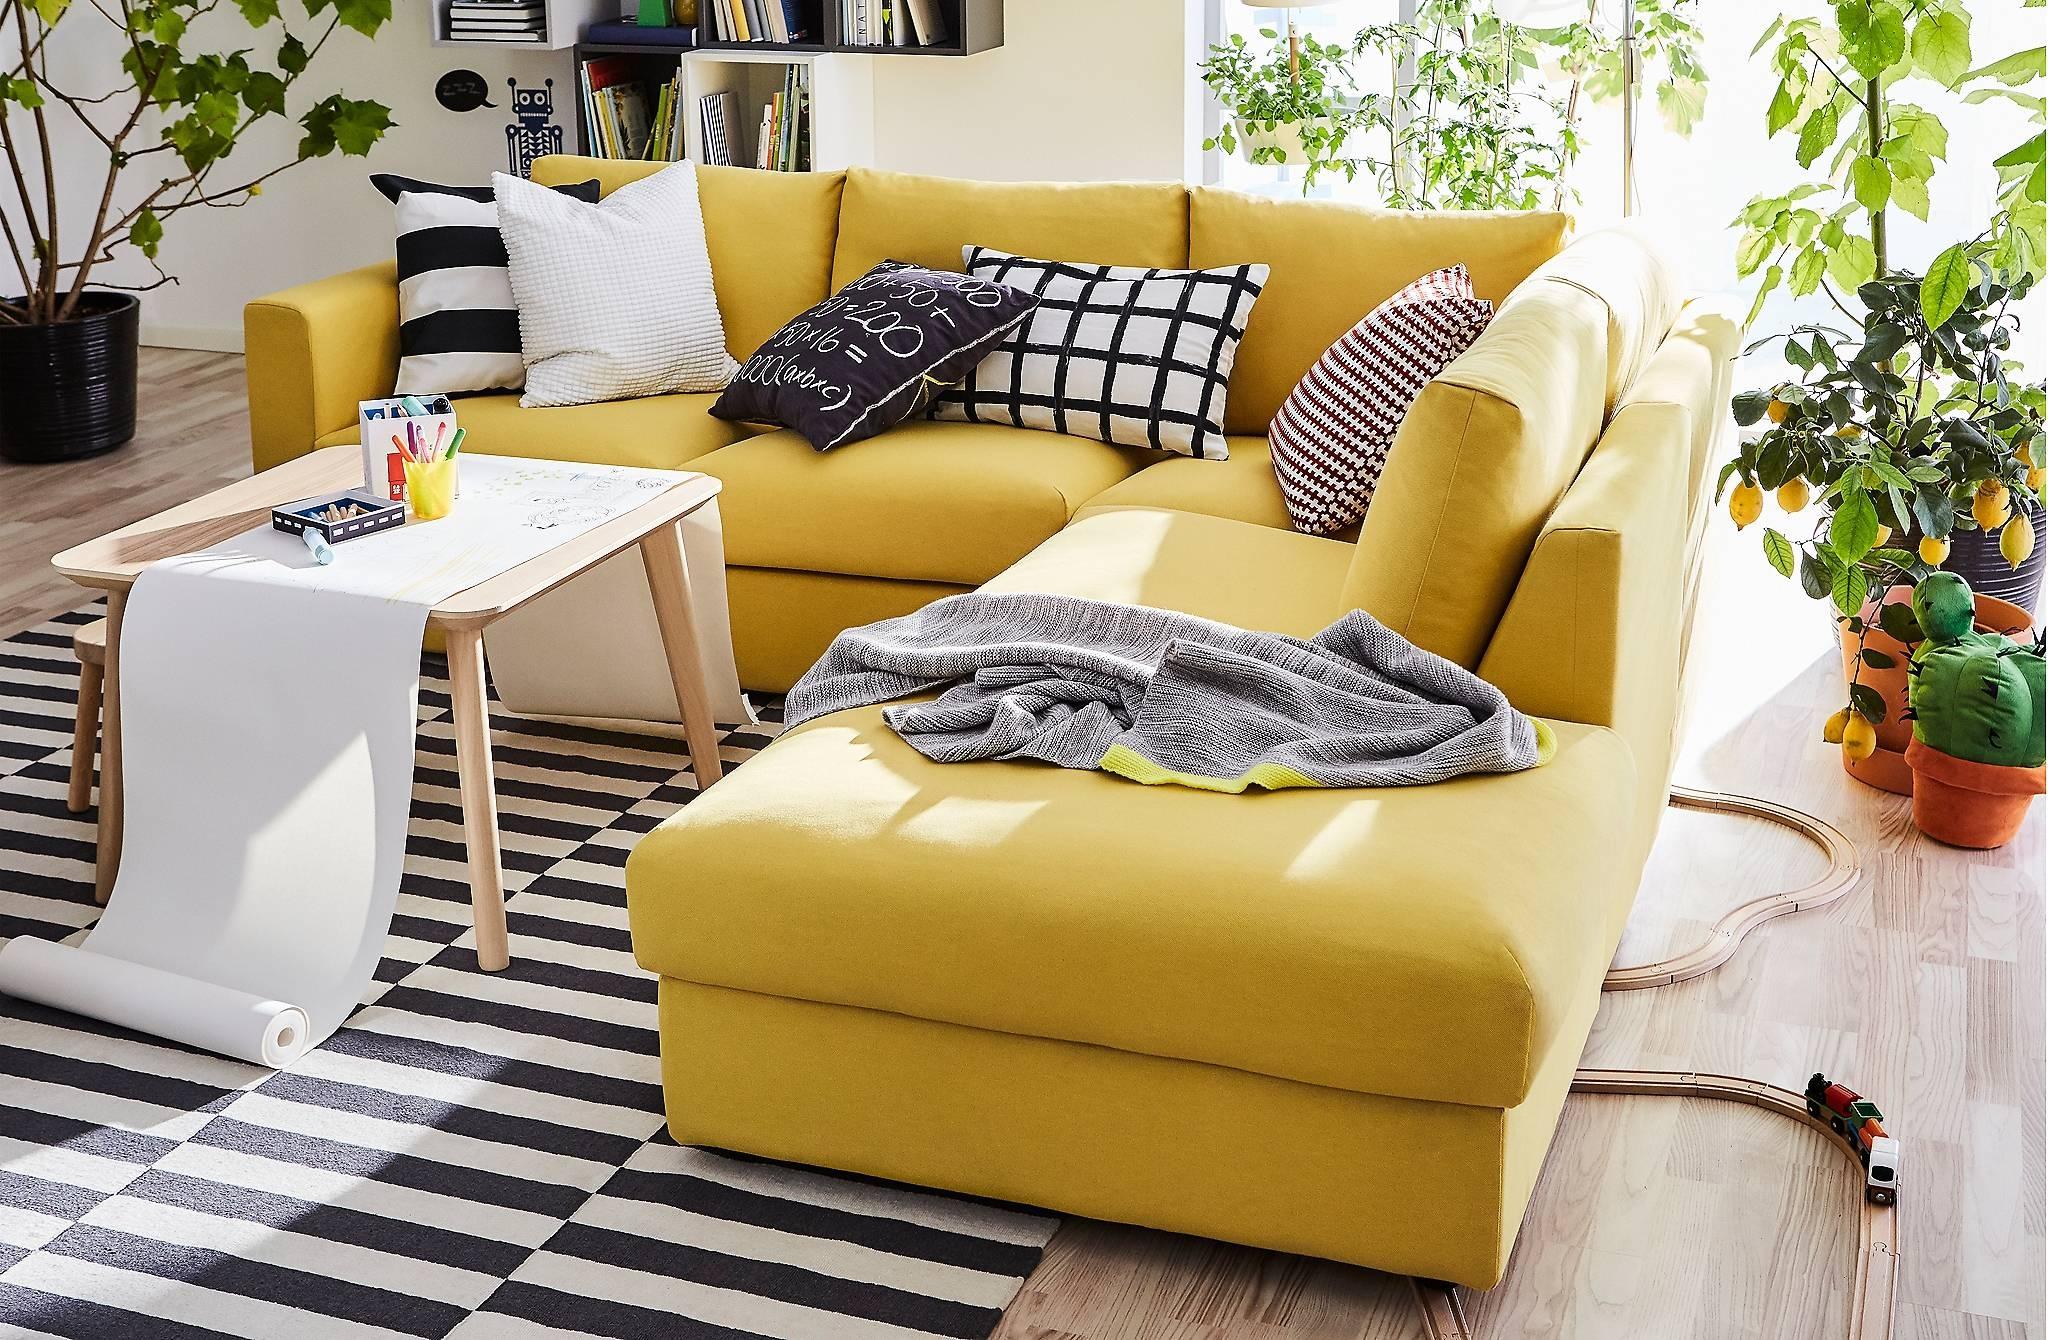 Vimle Regarding Yellow Sectional Sofas (View 14 of 15)